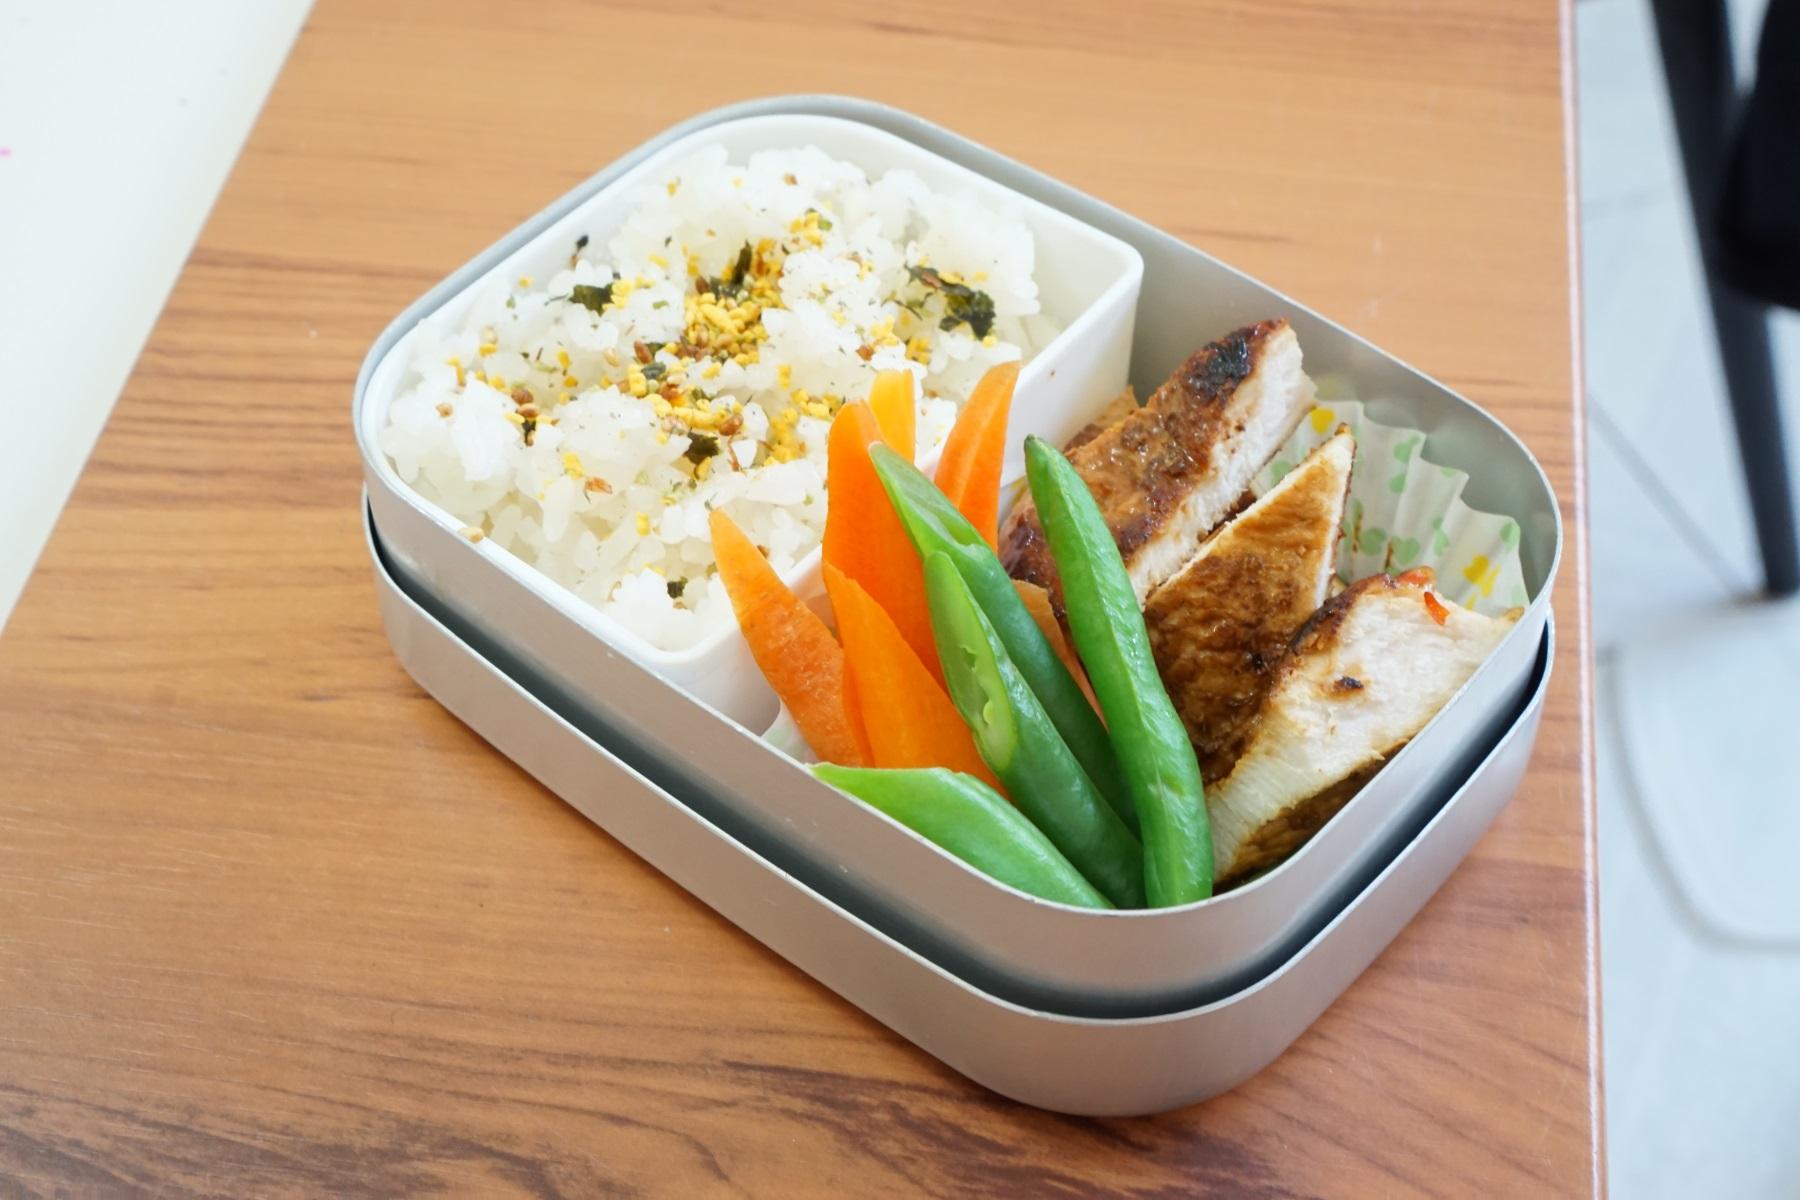 lunchboxidea7.jpg